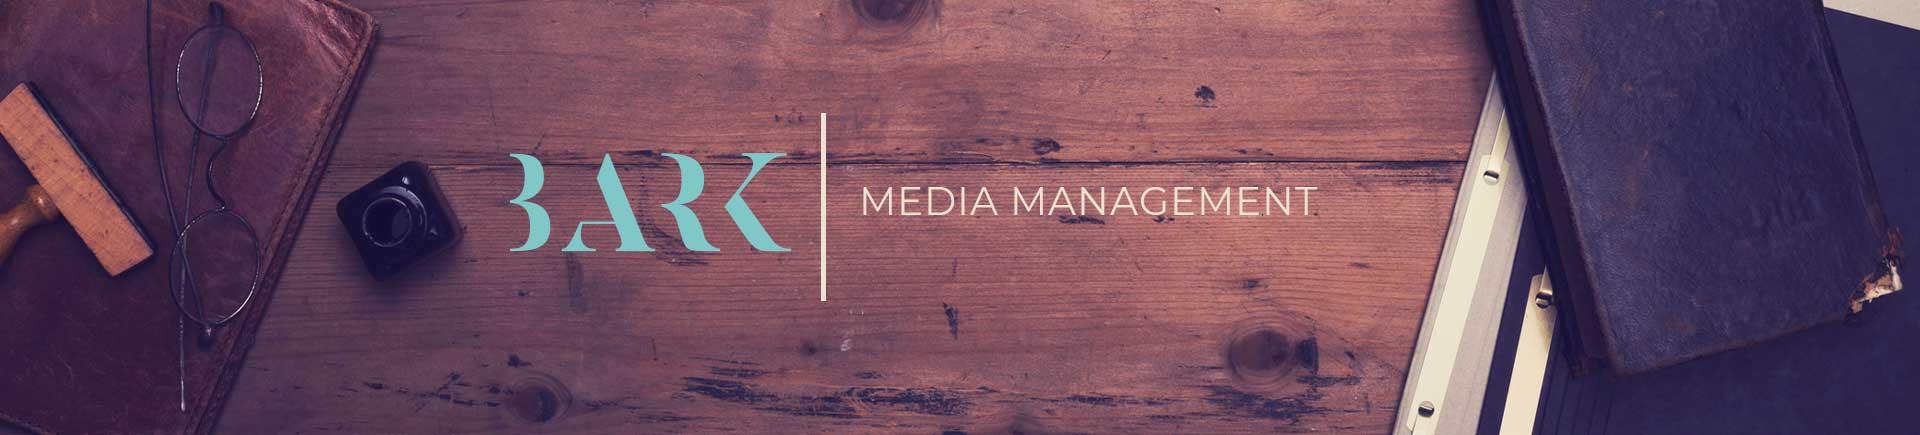 creative media management for businesses